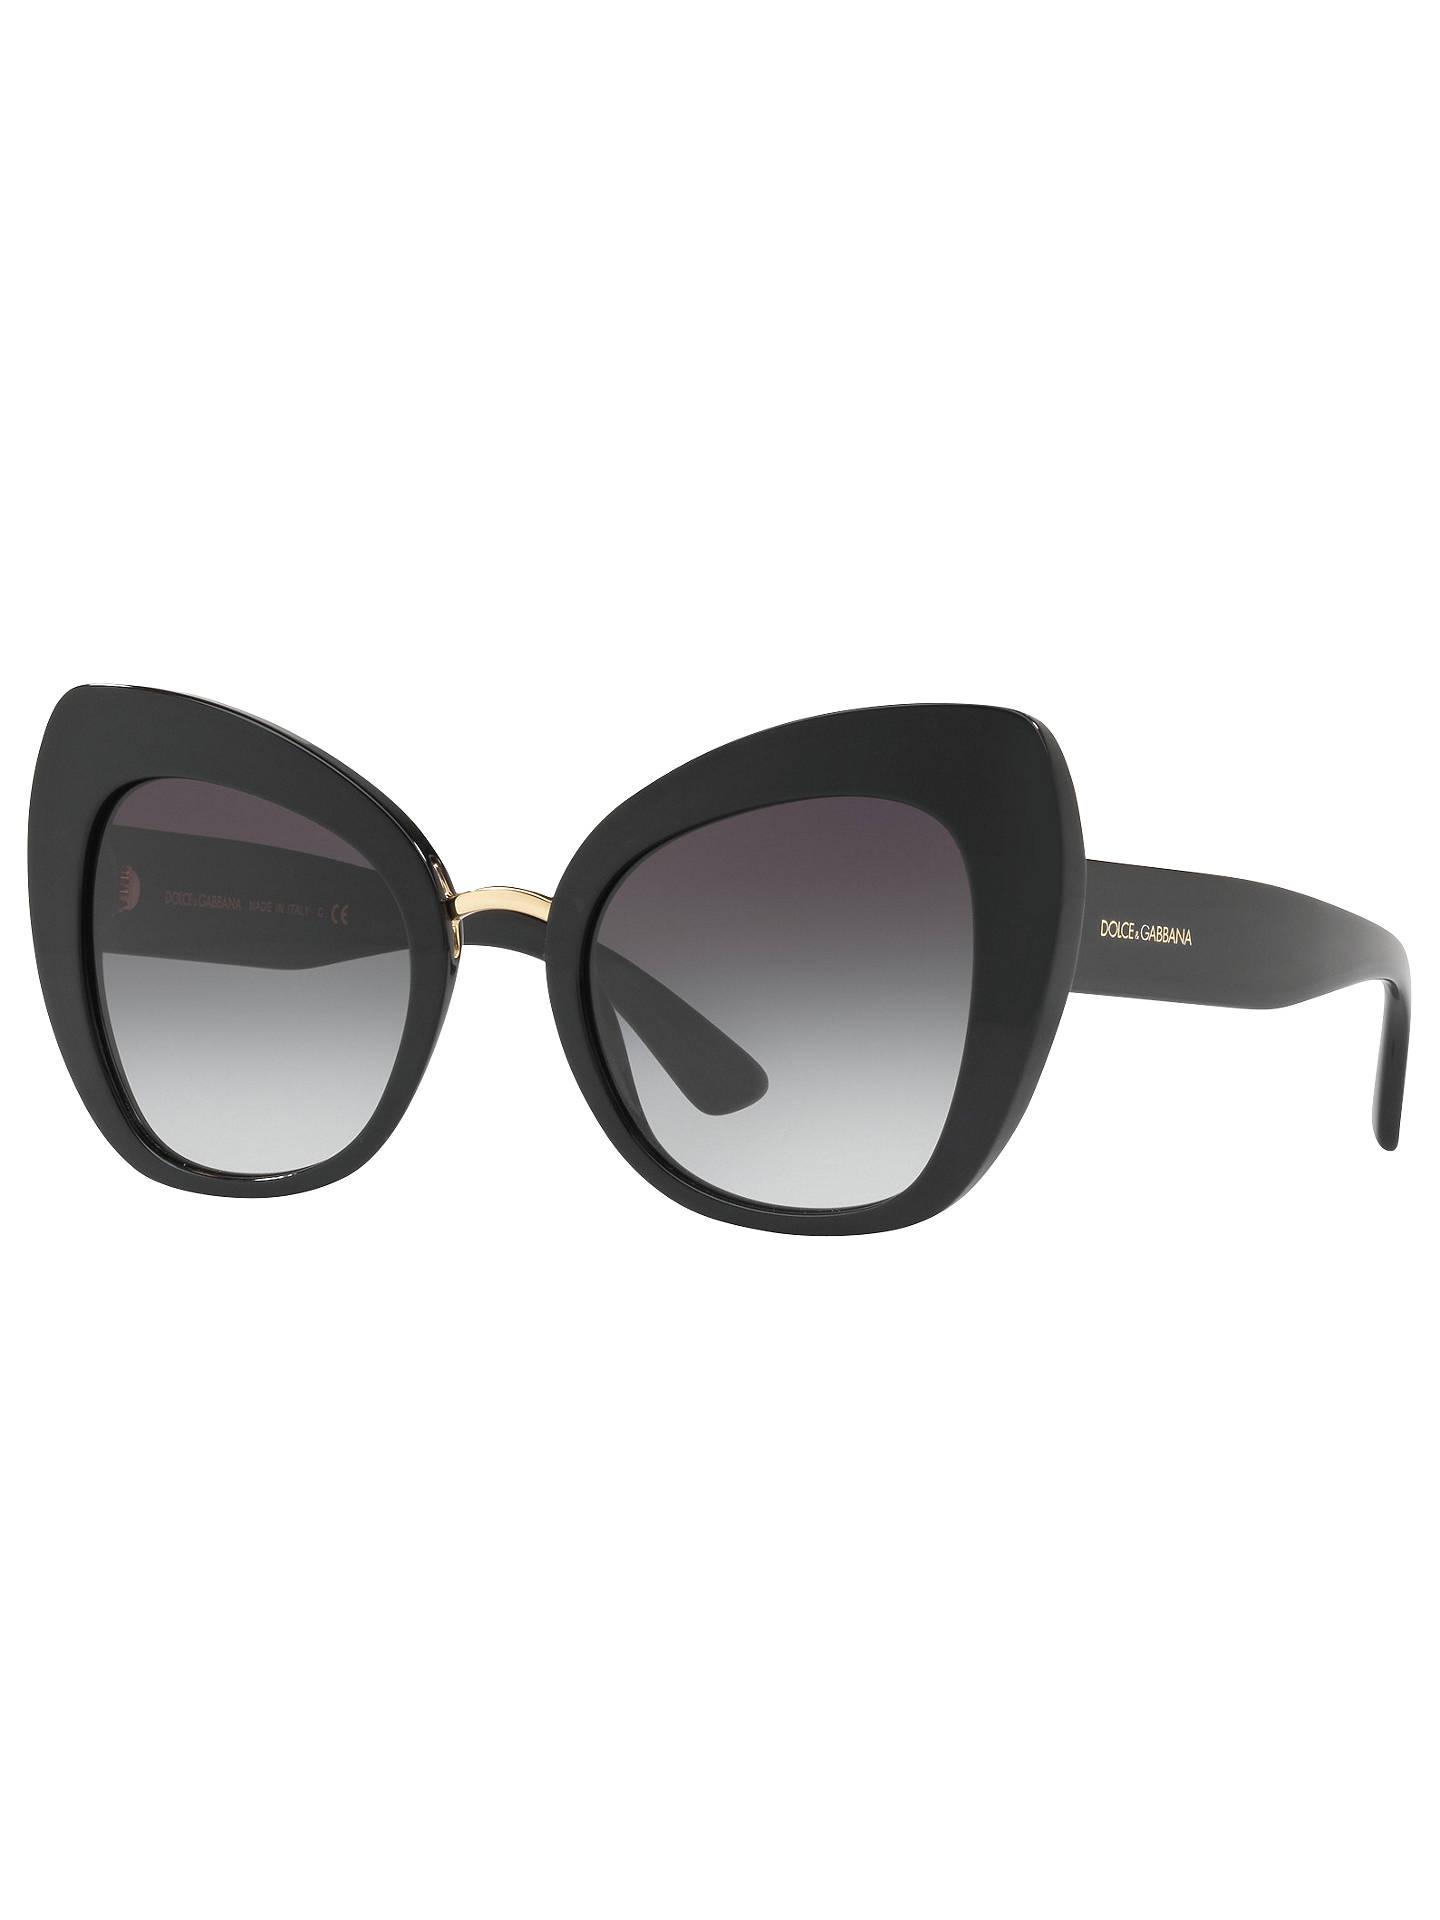 abde6786b0 Buy Dolce & Gabbana DG4319 Cat's Eye Sunglasses, Black/Grey Gradient Online  at johnlewis ...